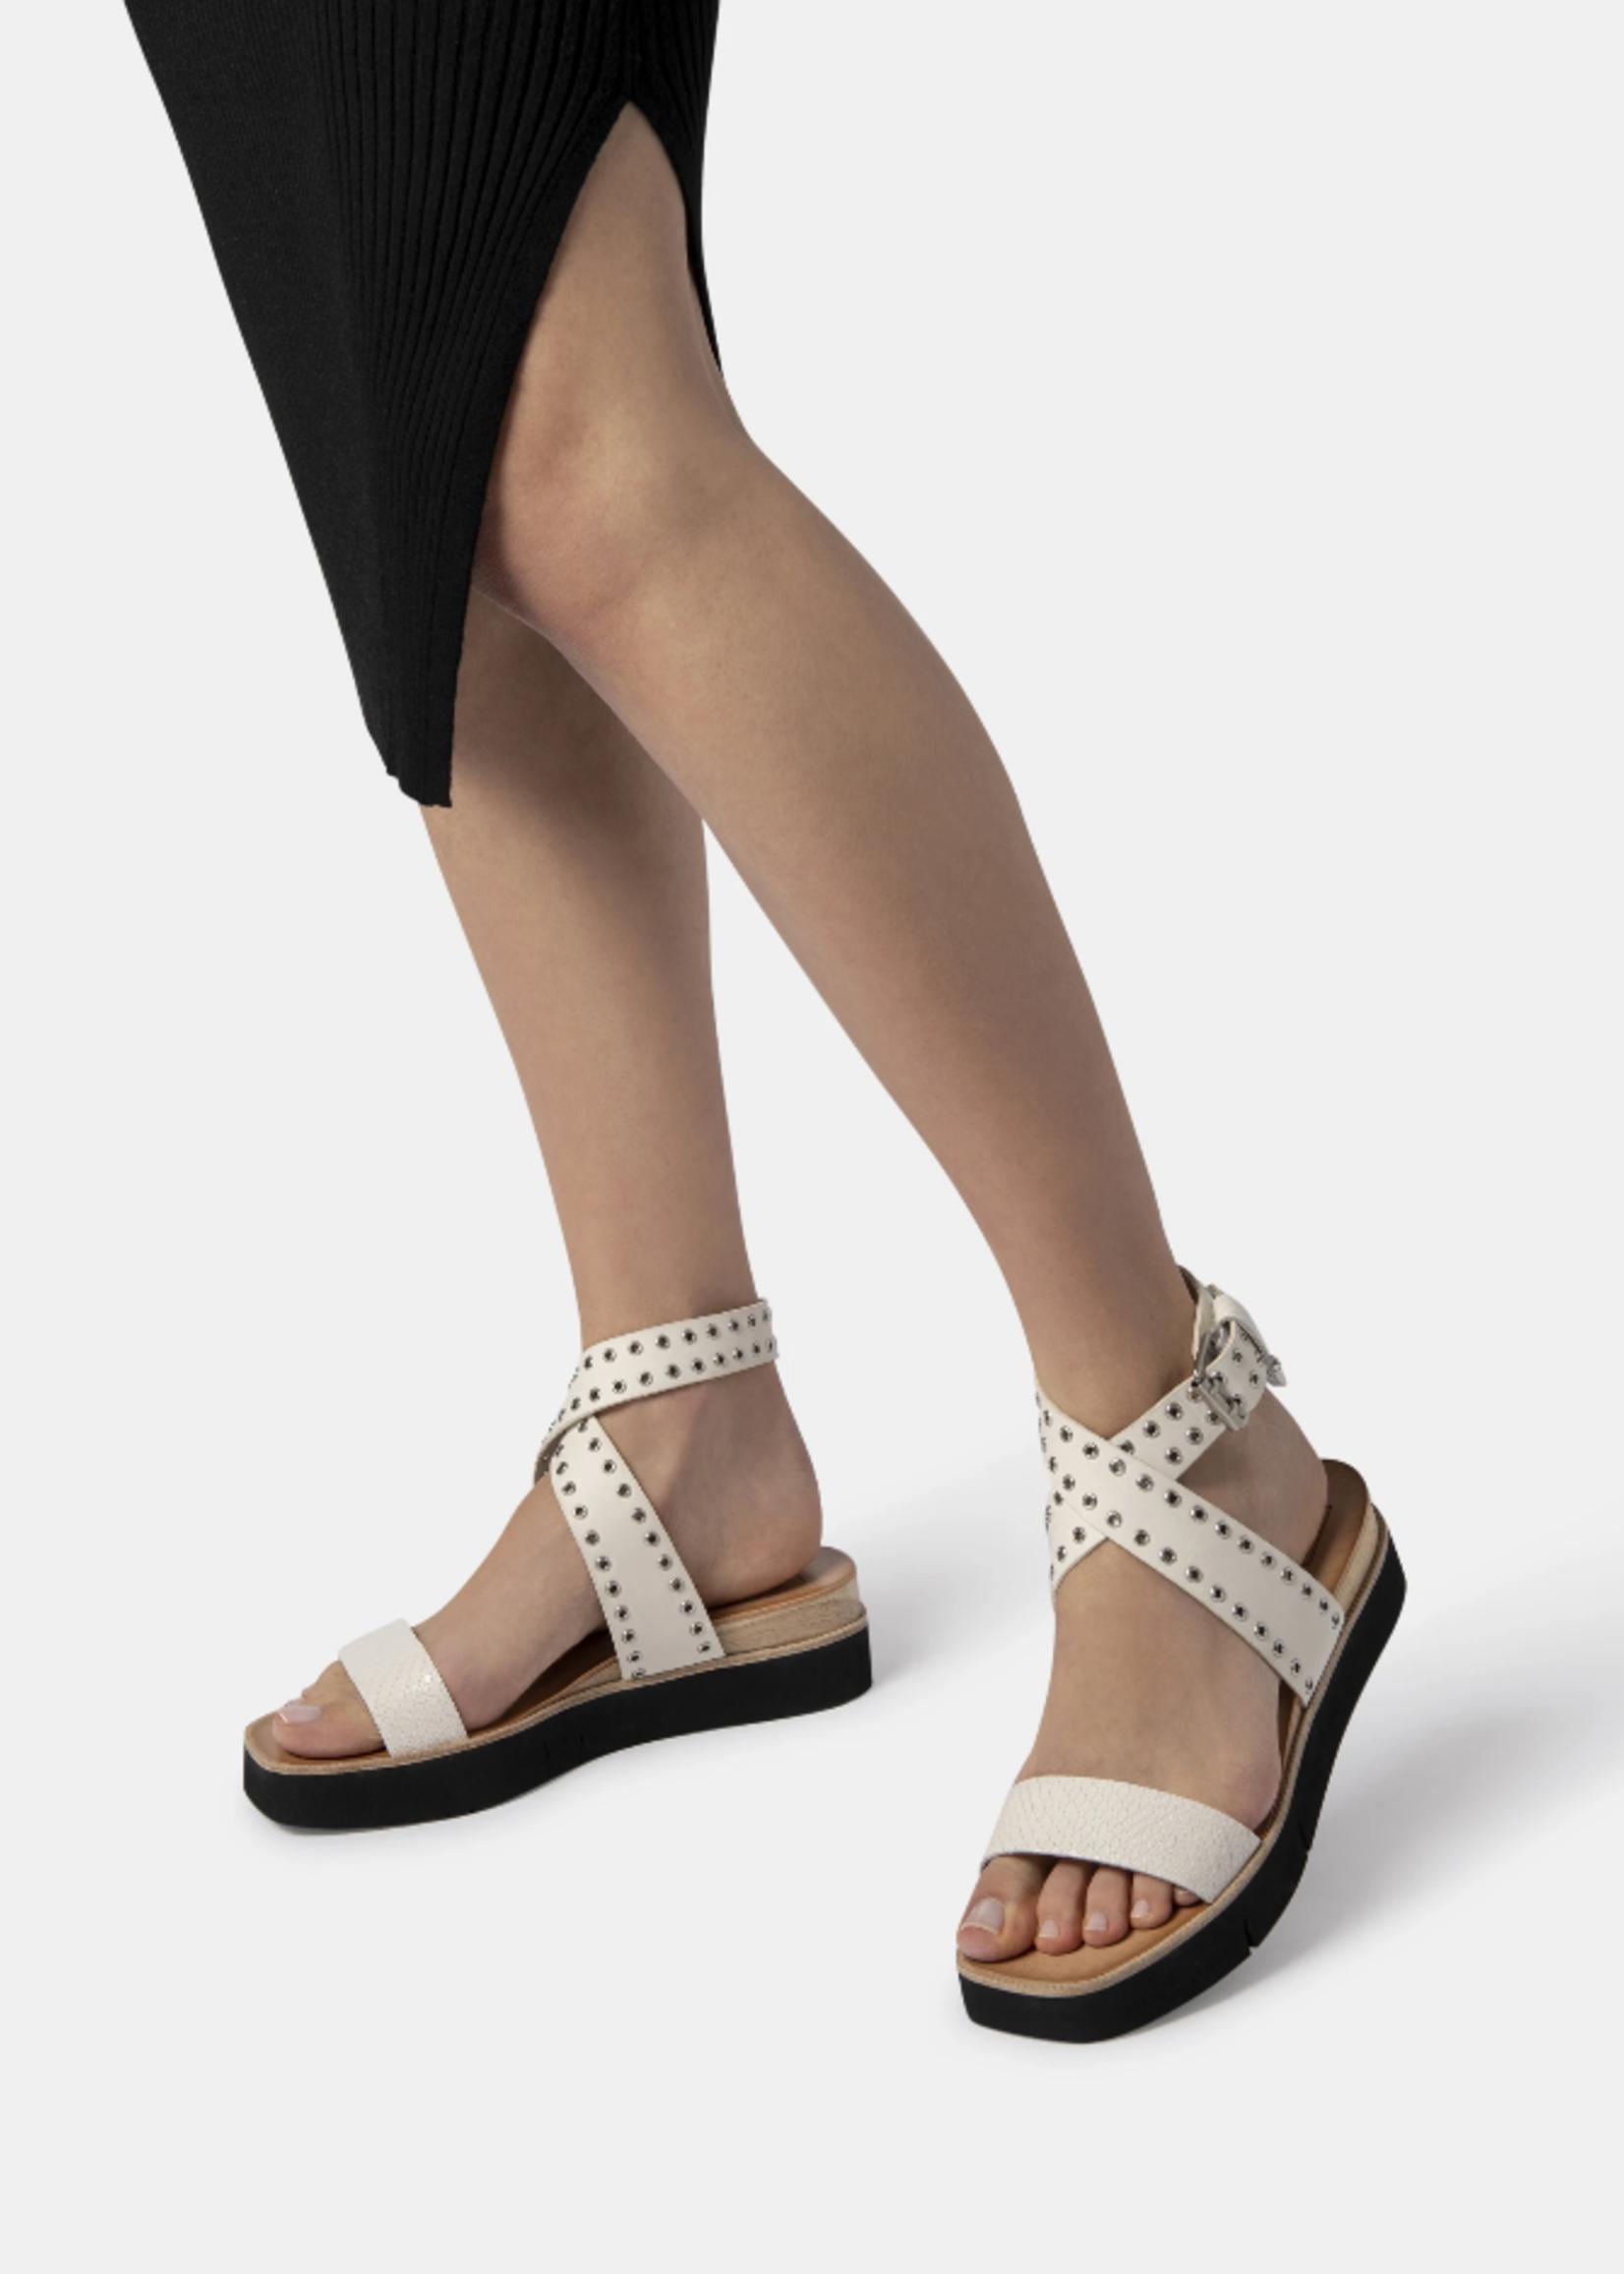 Dolce Vita Panko - Embossed Leather Stud - White